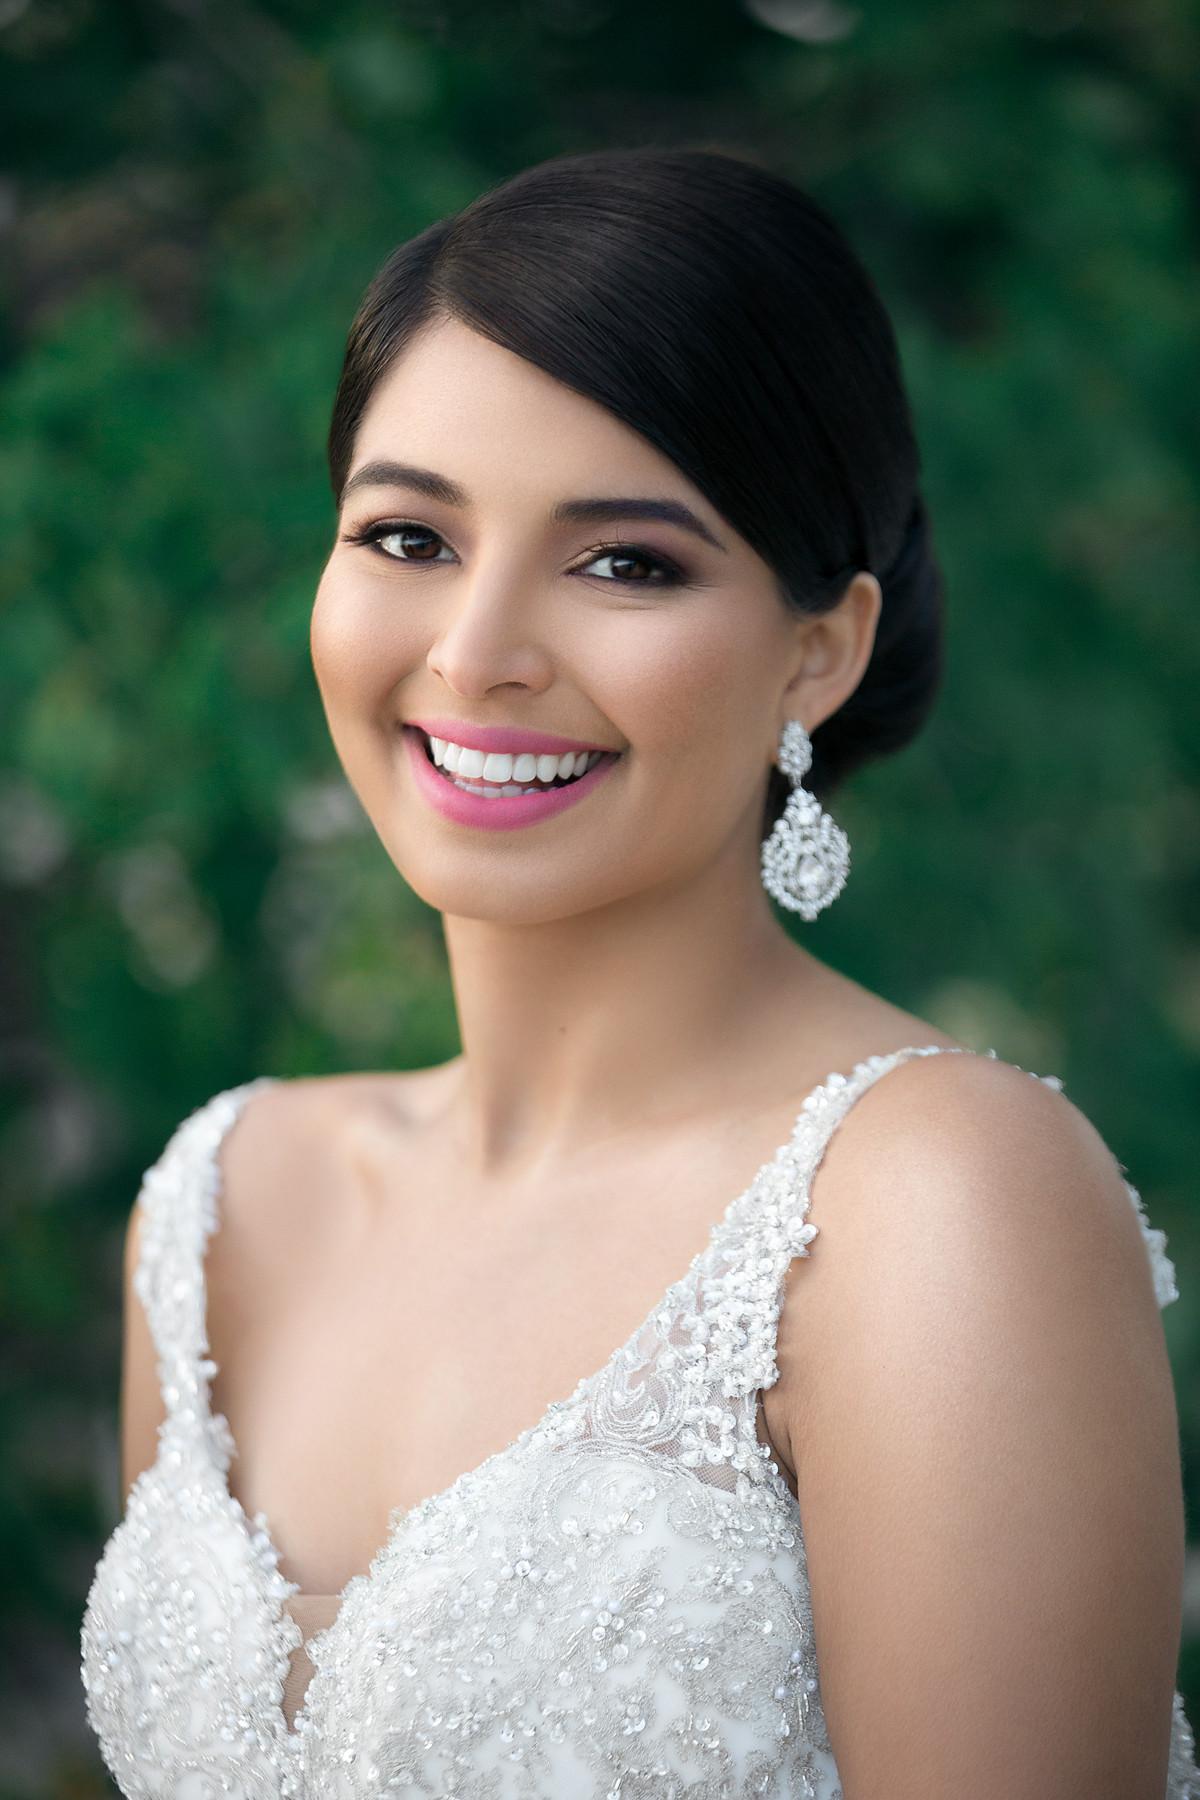 Bridal Make-Up Consultation